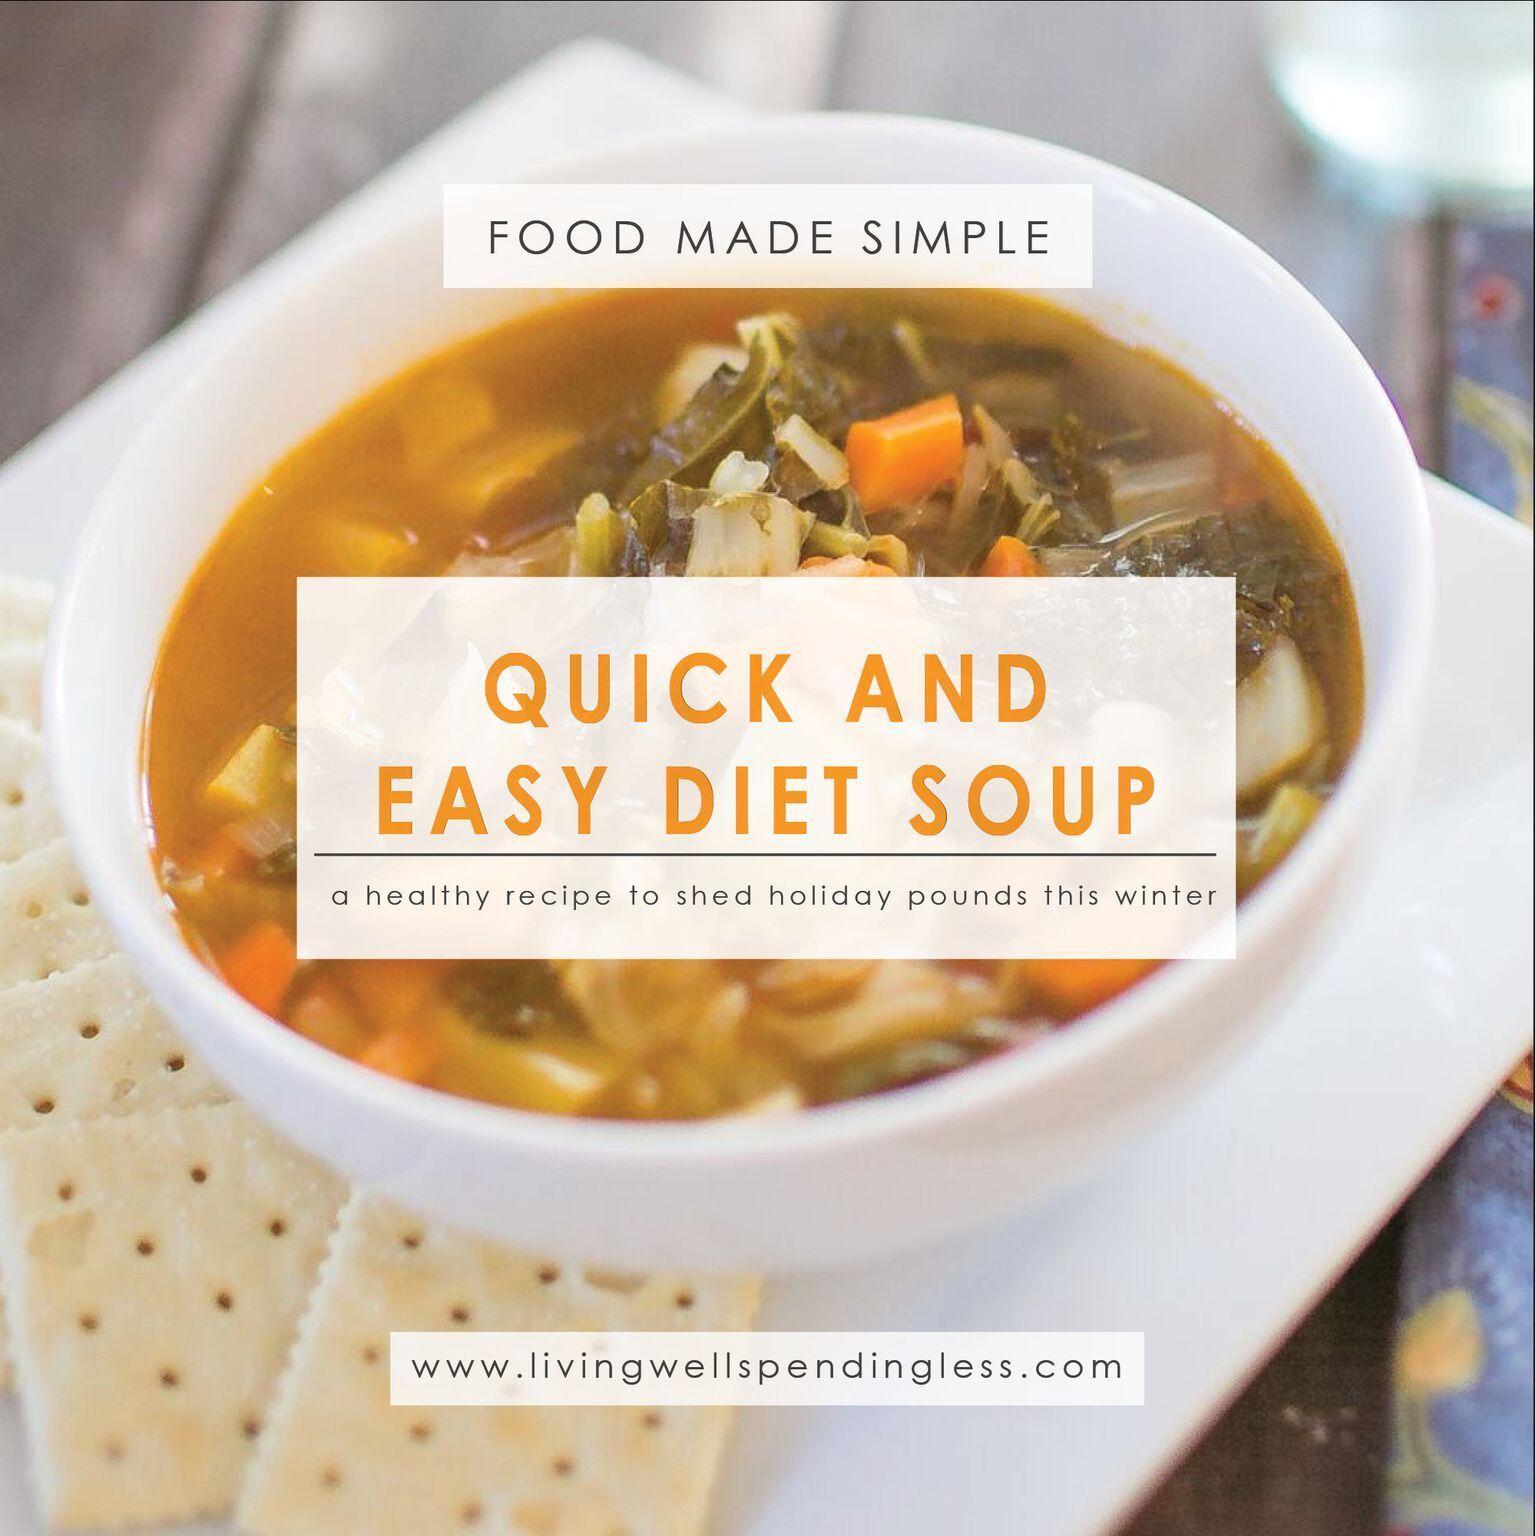 Winter diet soup | recipe | food to enjoy | pinterest | diet soup images